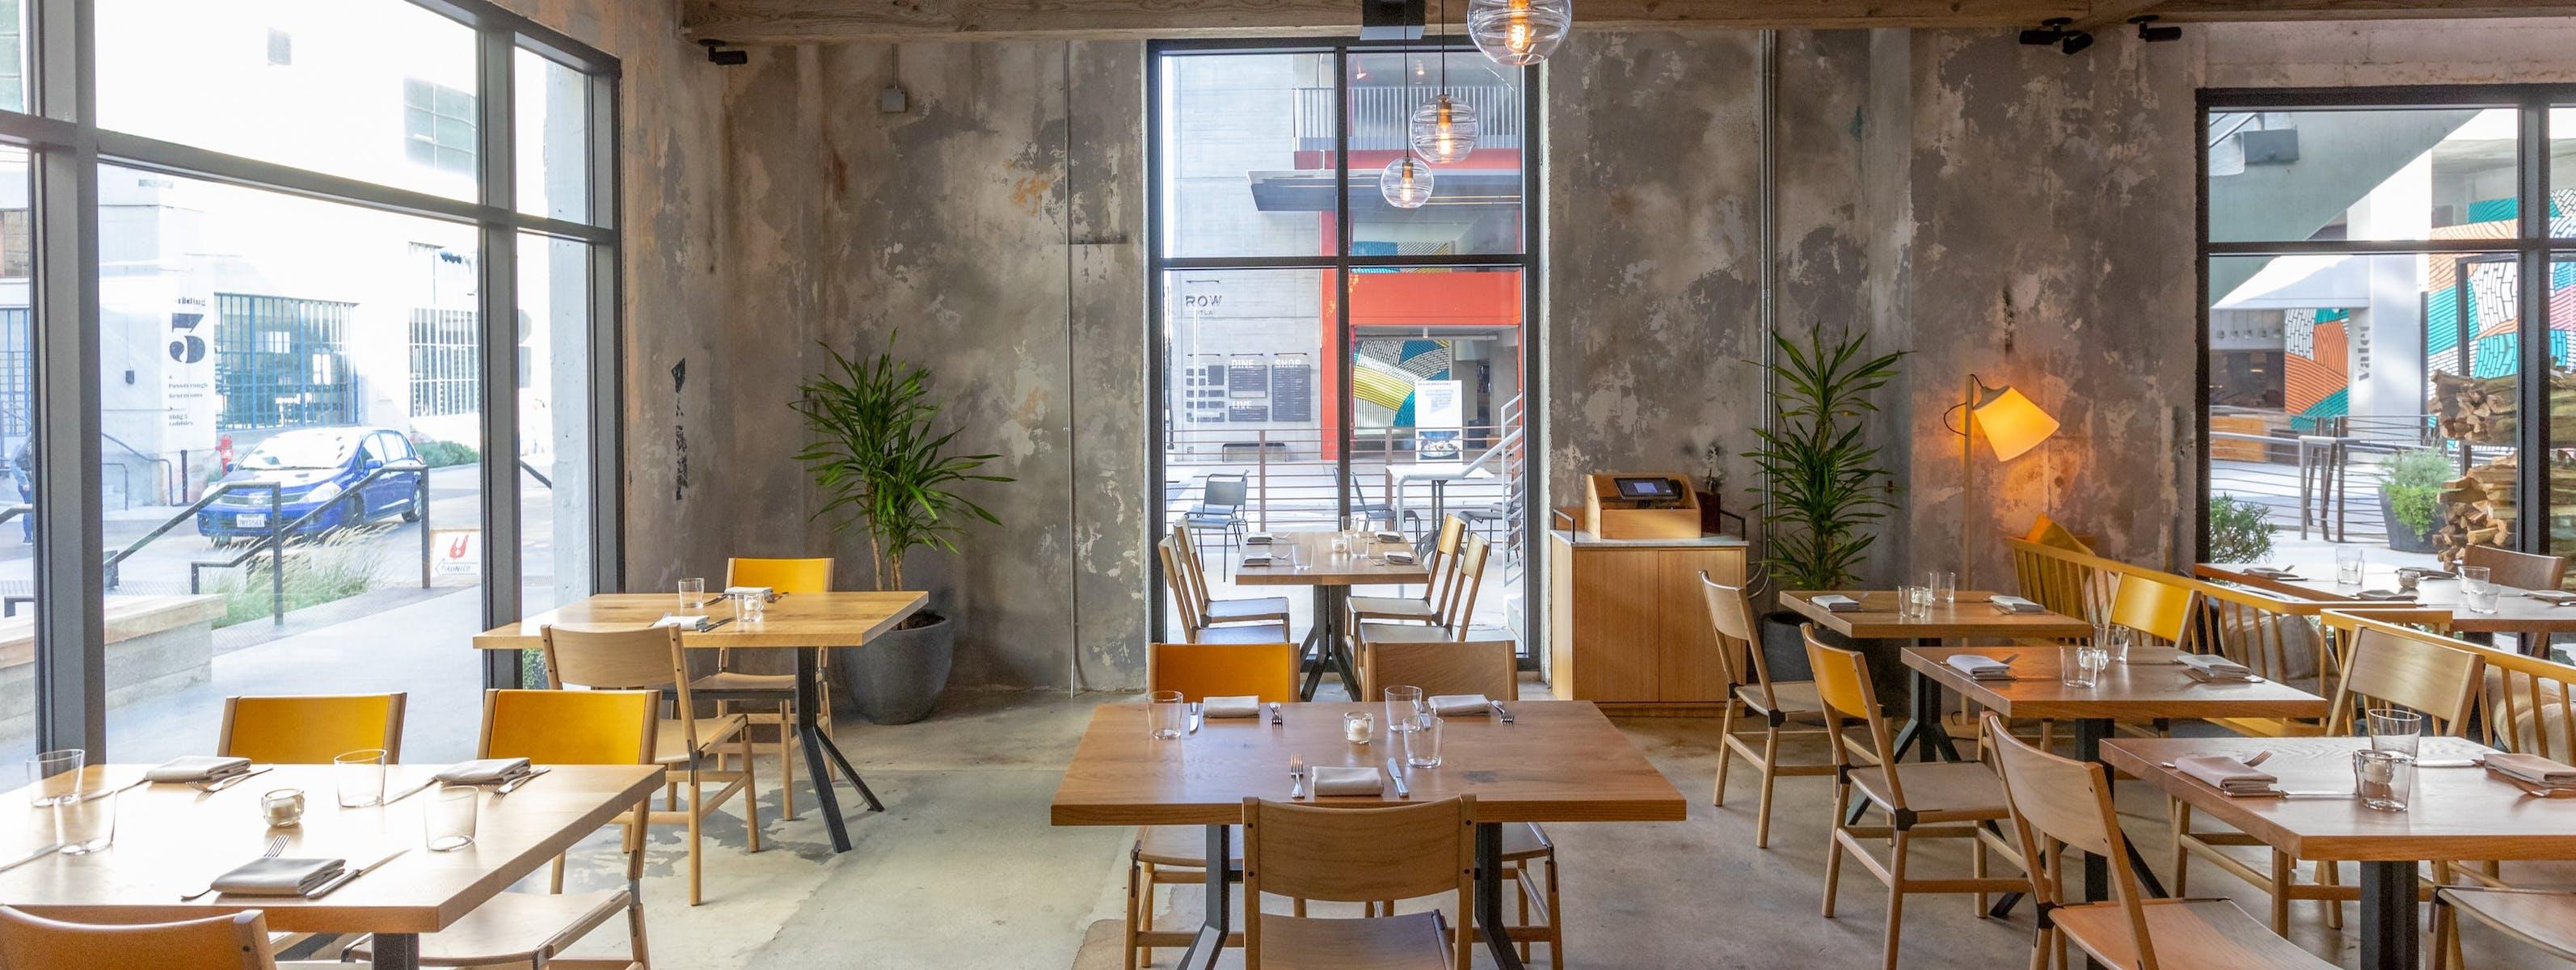 24 La Restaurants Where You Can Actually Find Parking Los Angeles The Infatuation,Michelangelo David Head Sculpture